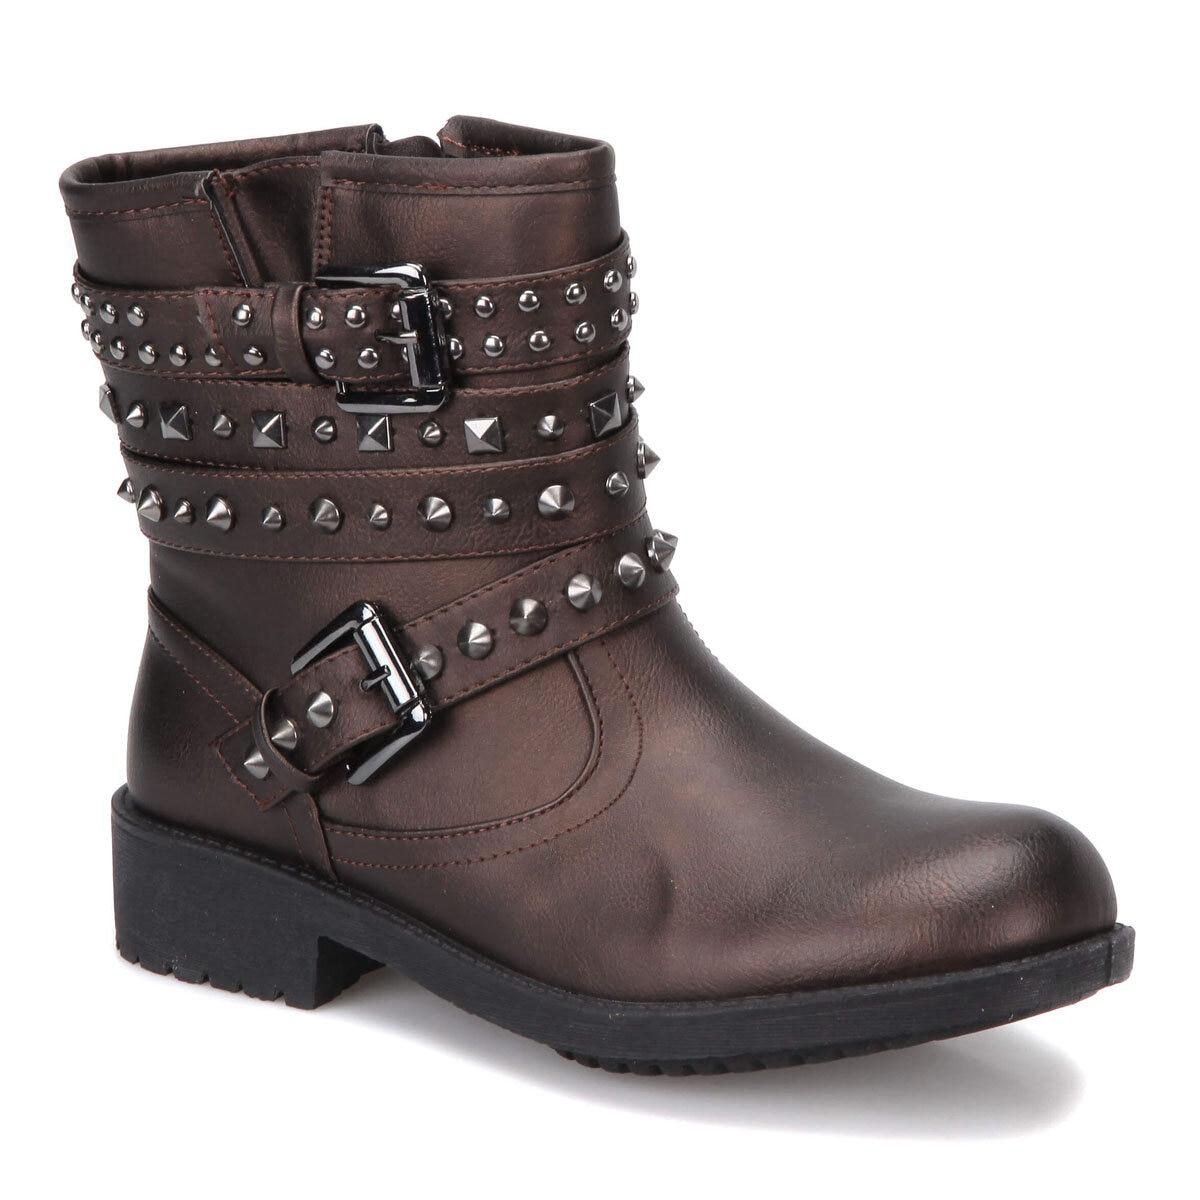 FLO 72.354200.Z Brown Women 'S Boots Polaris